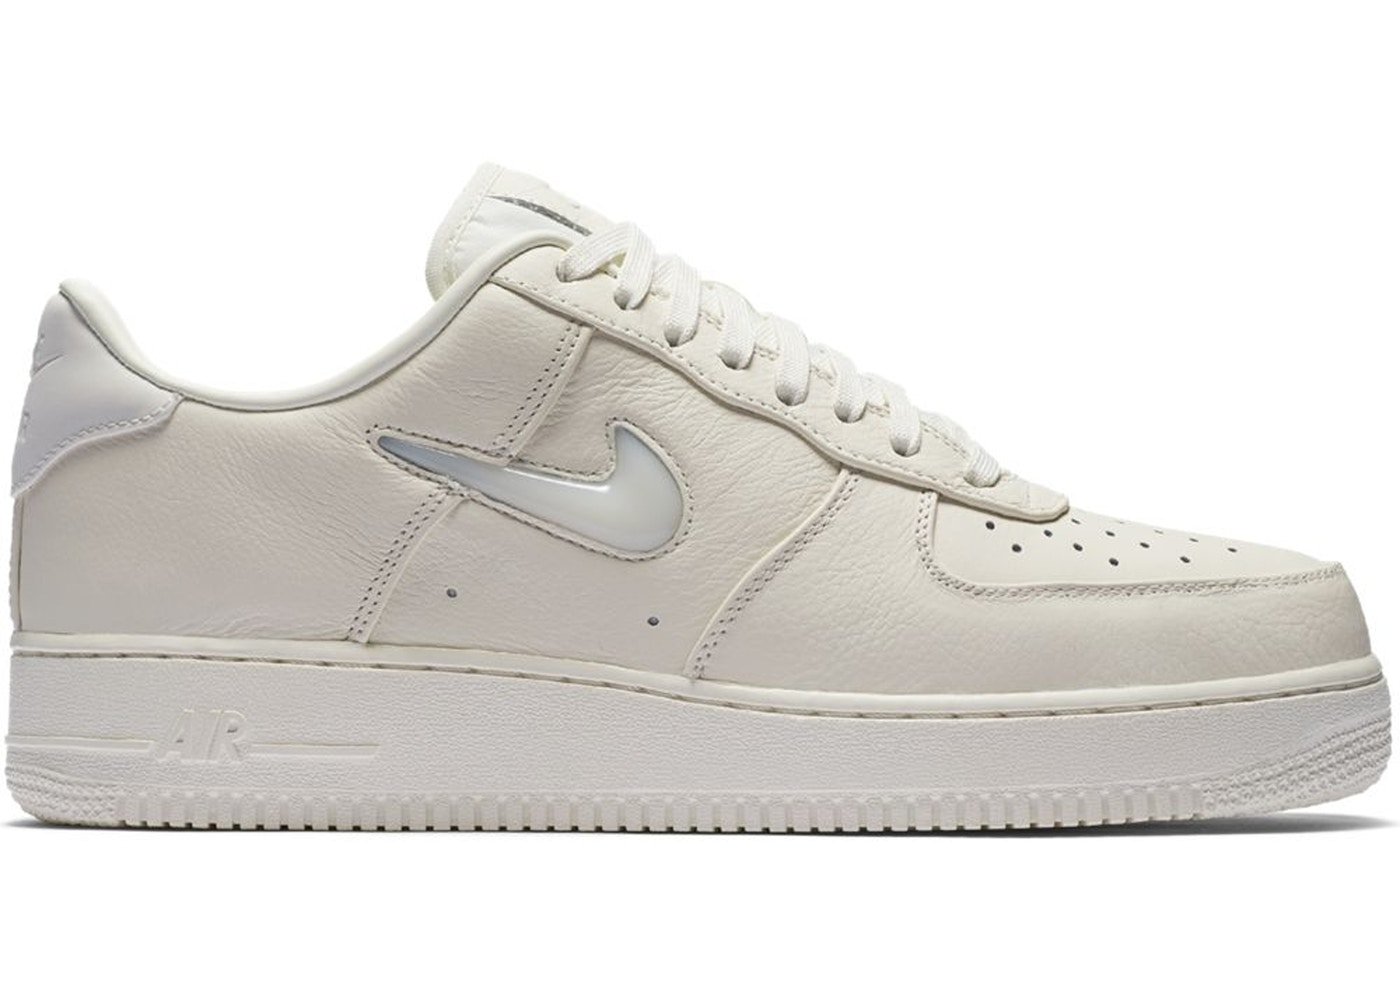 Nike Air Force 1 Low Jewel Sail - 941912-100